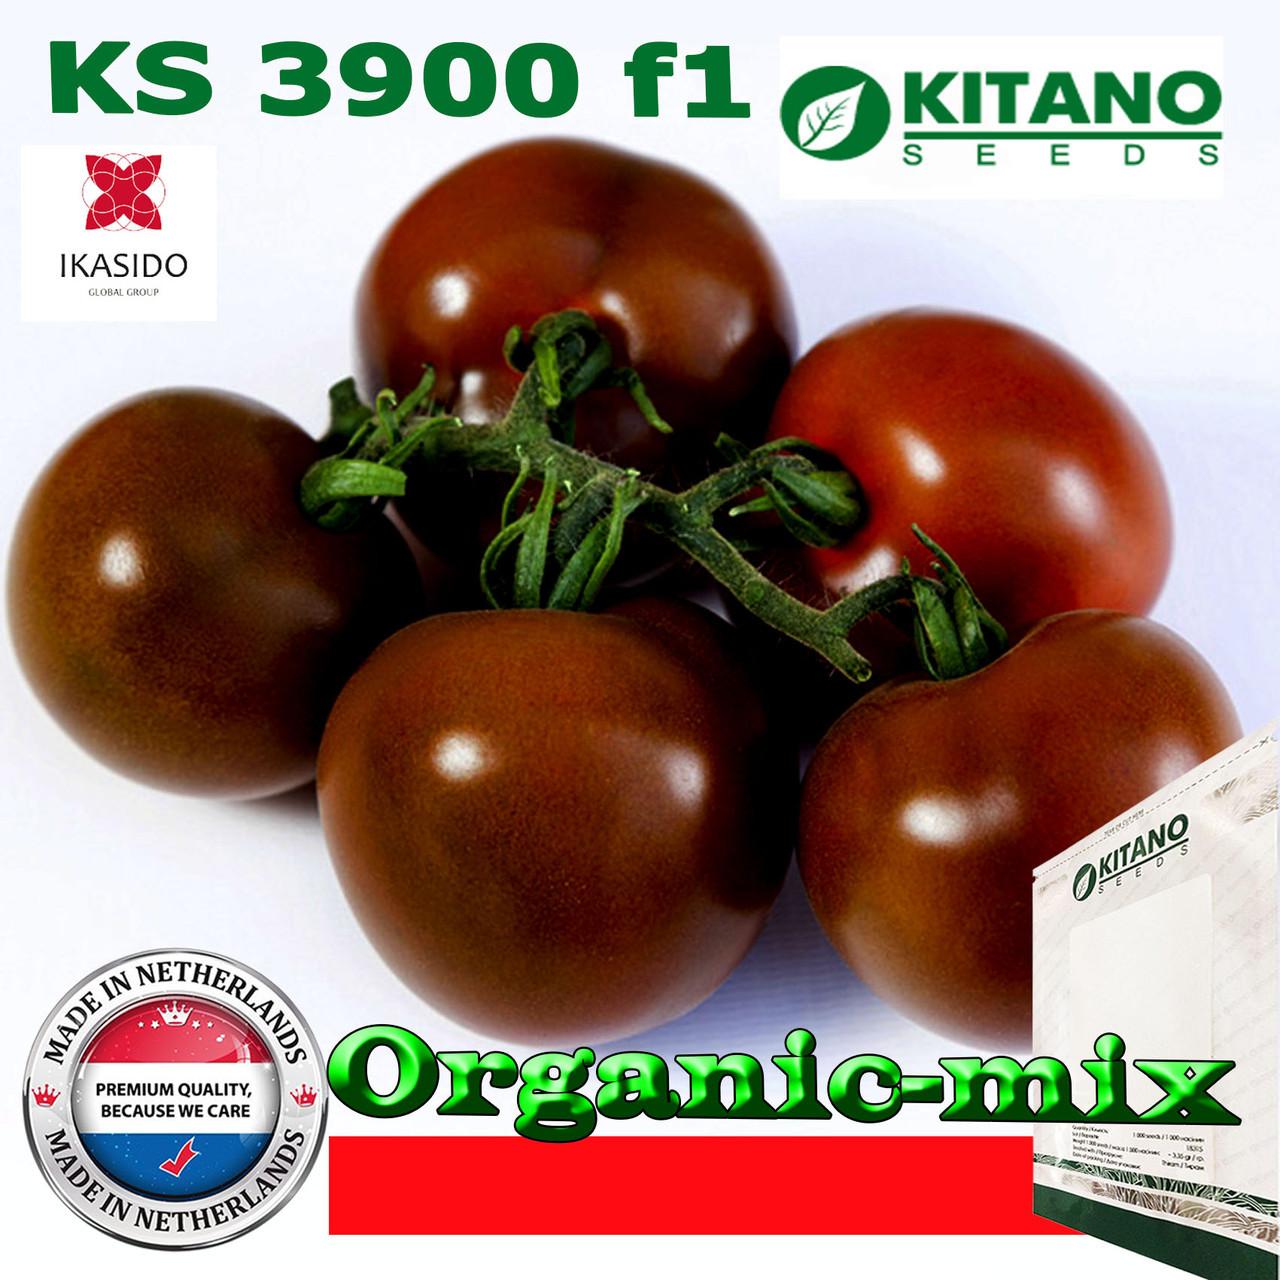 Семена, томат индетерминантный, коричневый KS 3900 F1, ТМ Kitano Seeds, 500 семян